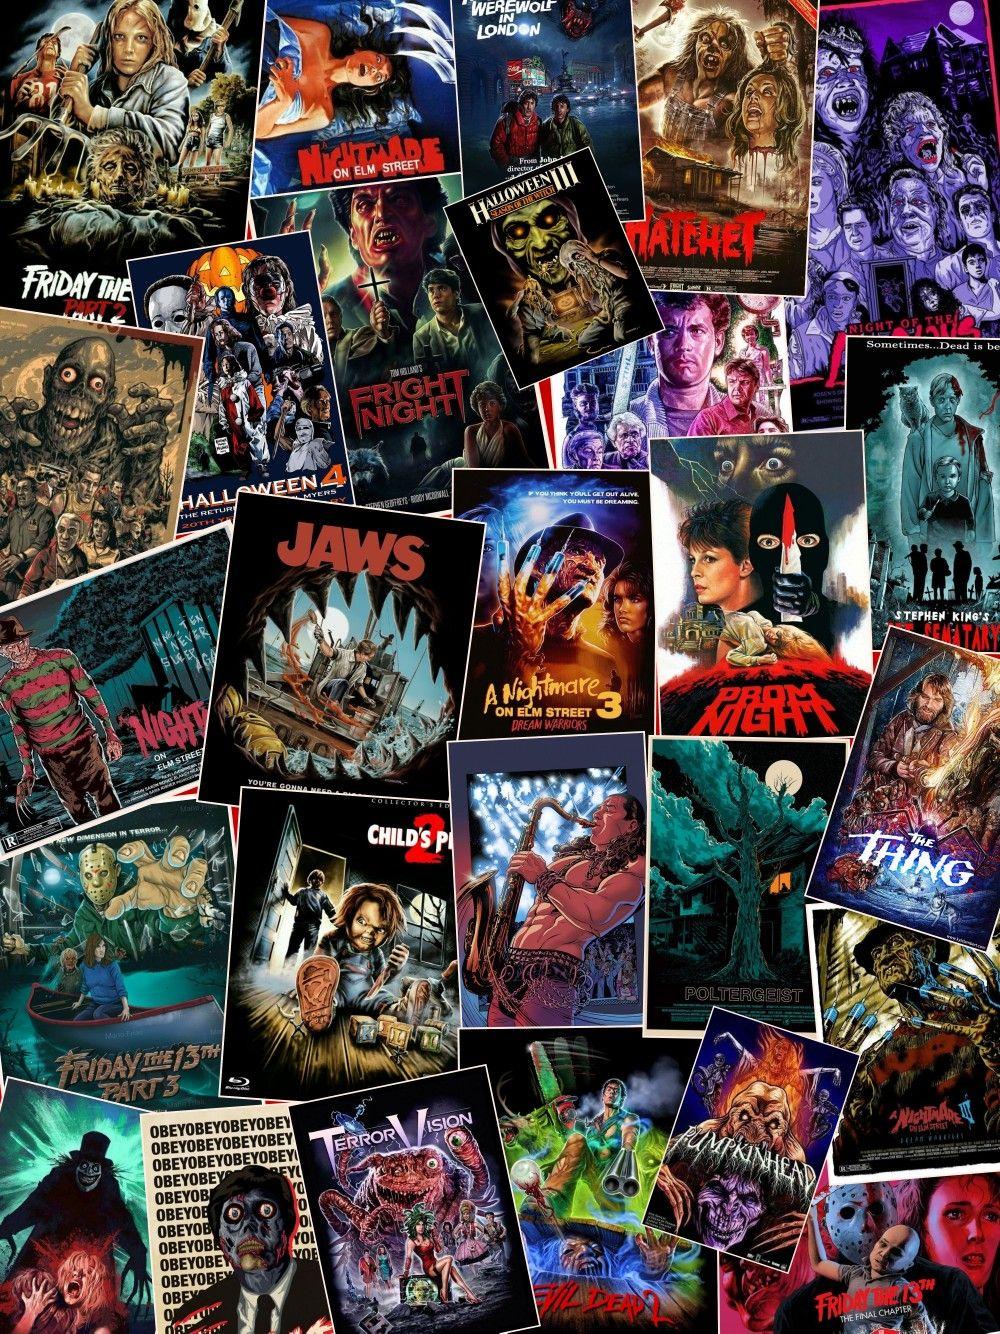 Horror movie poster collage movie collage